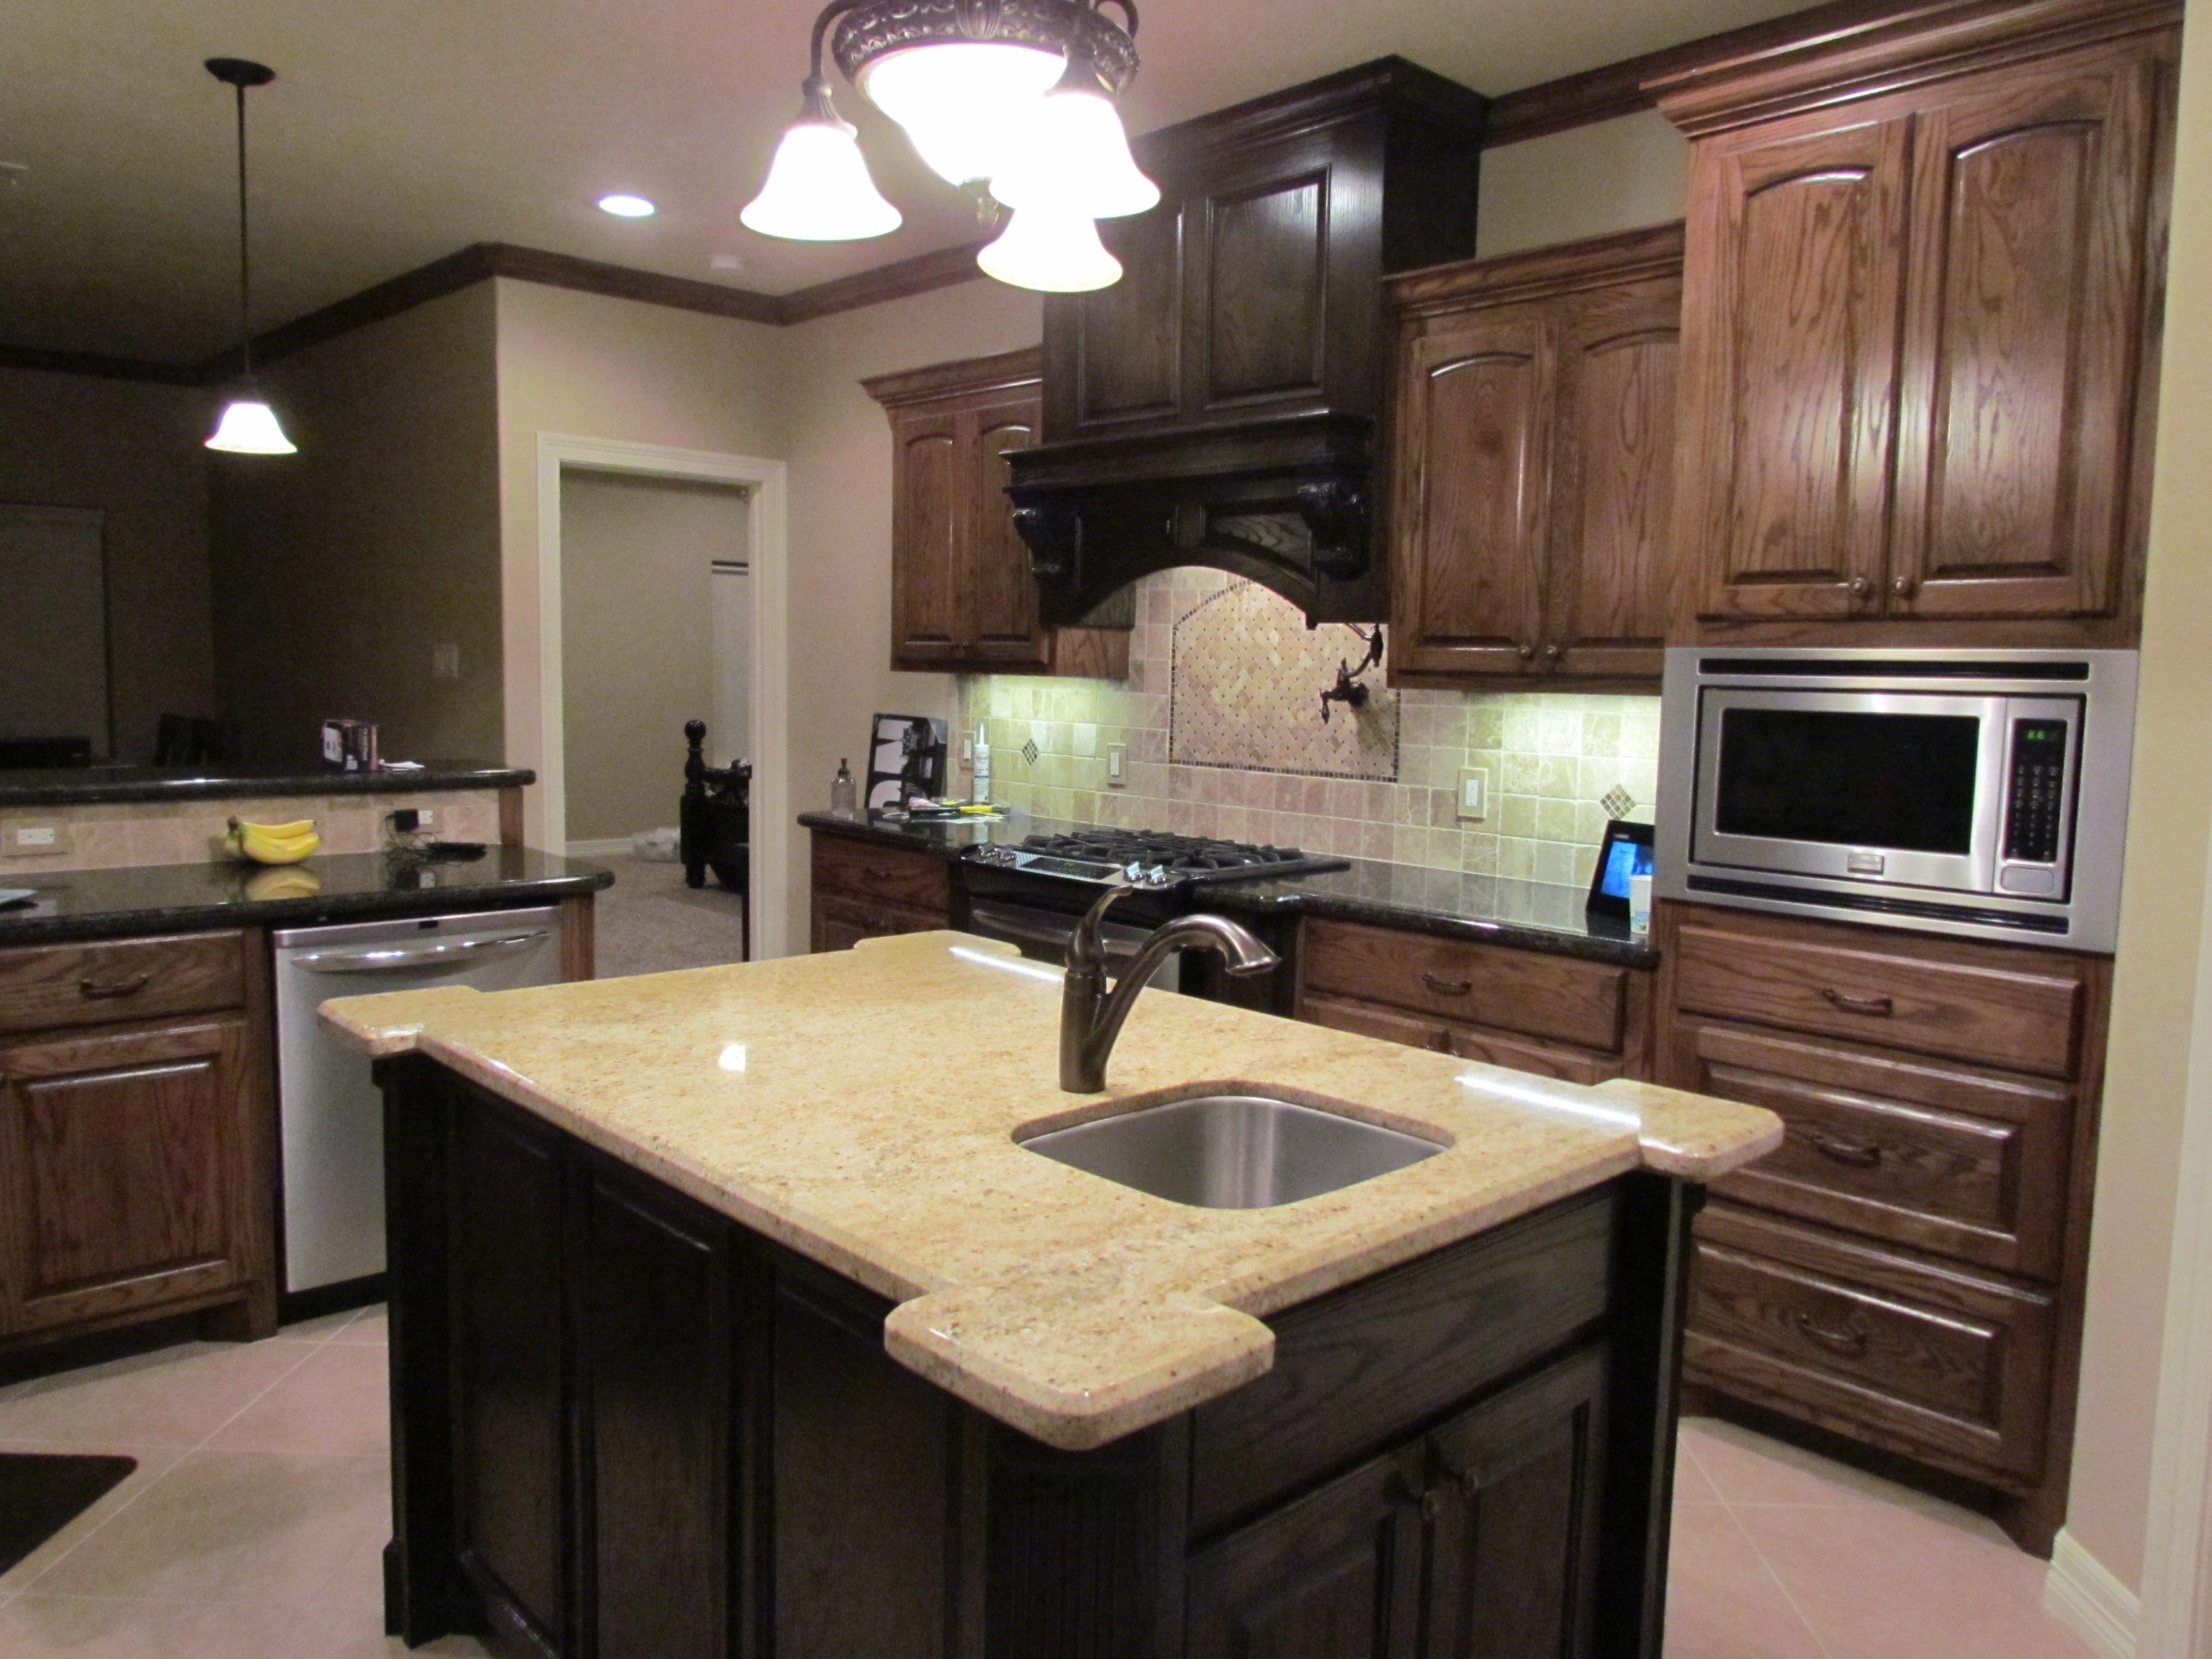 Kitchen island, pot filler, marble tile | Kitchen, Kitchen ...